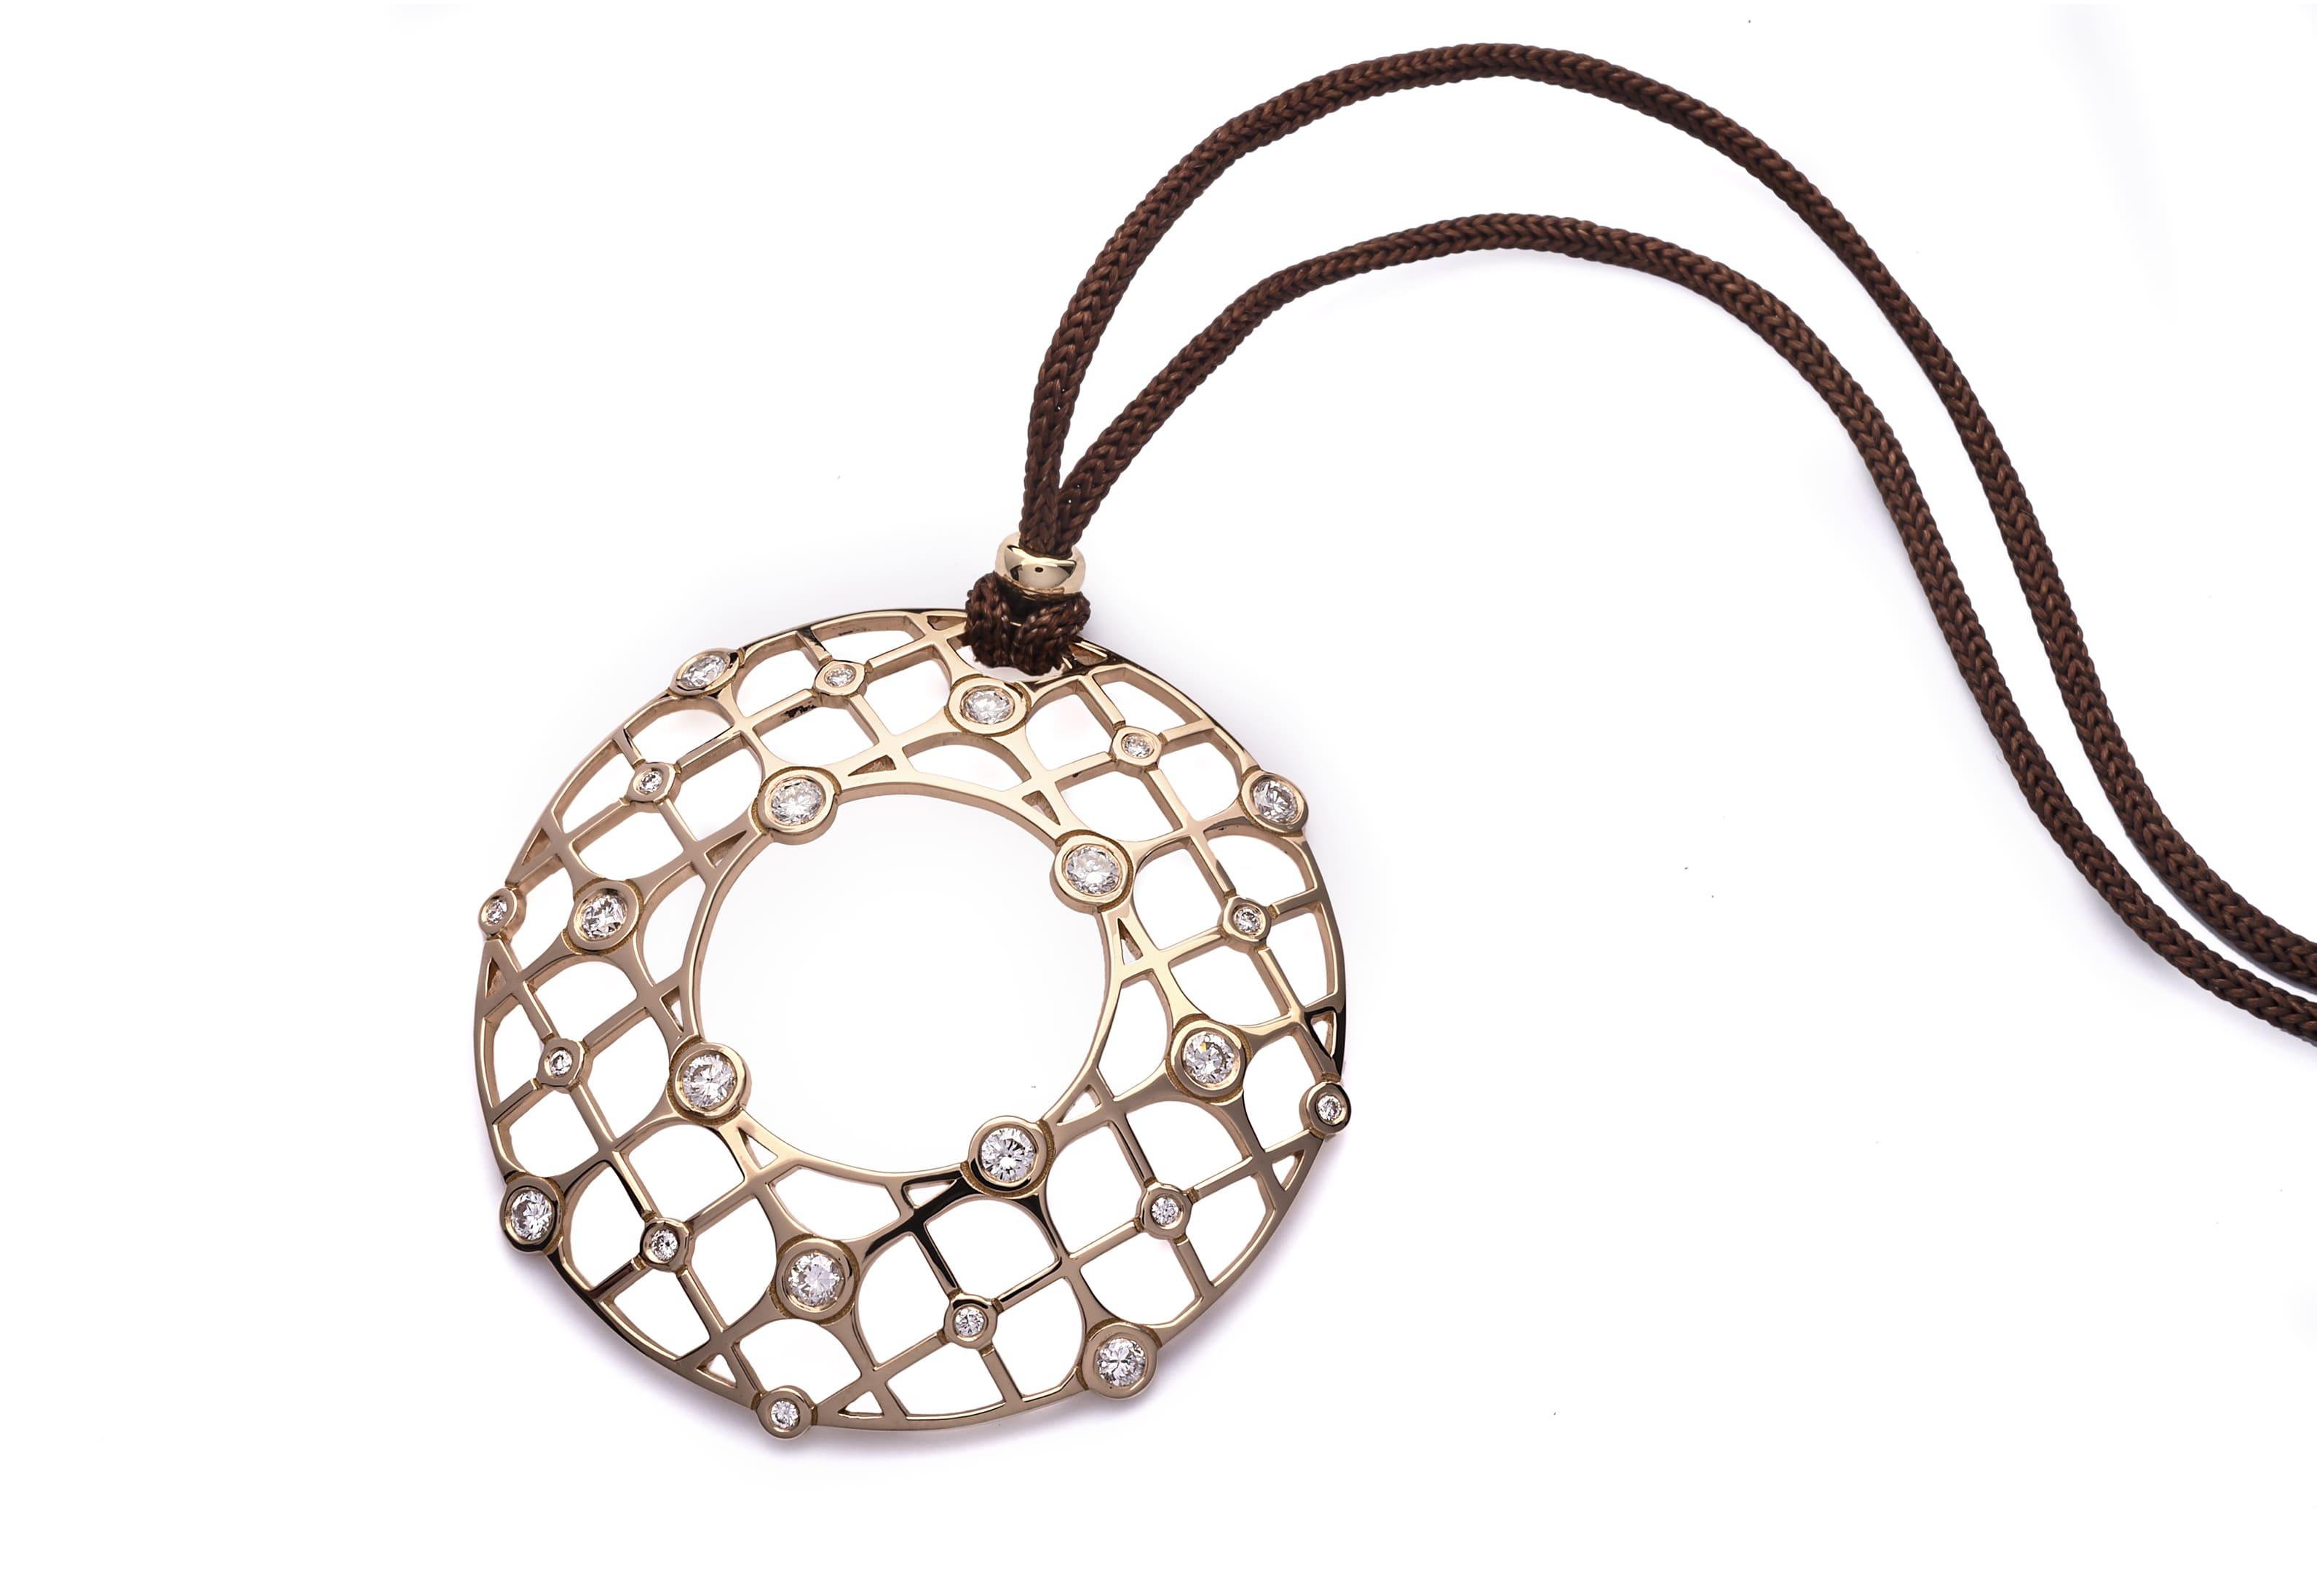 colgantes de oro y diamantes_ramon jewellers (4)